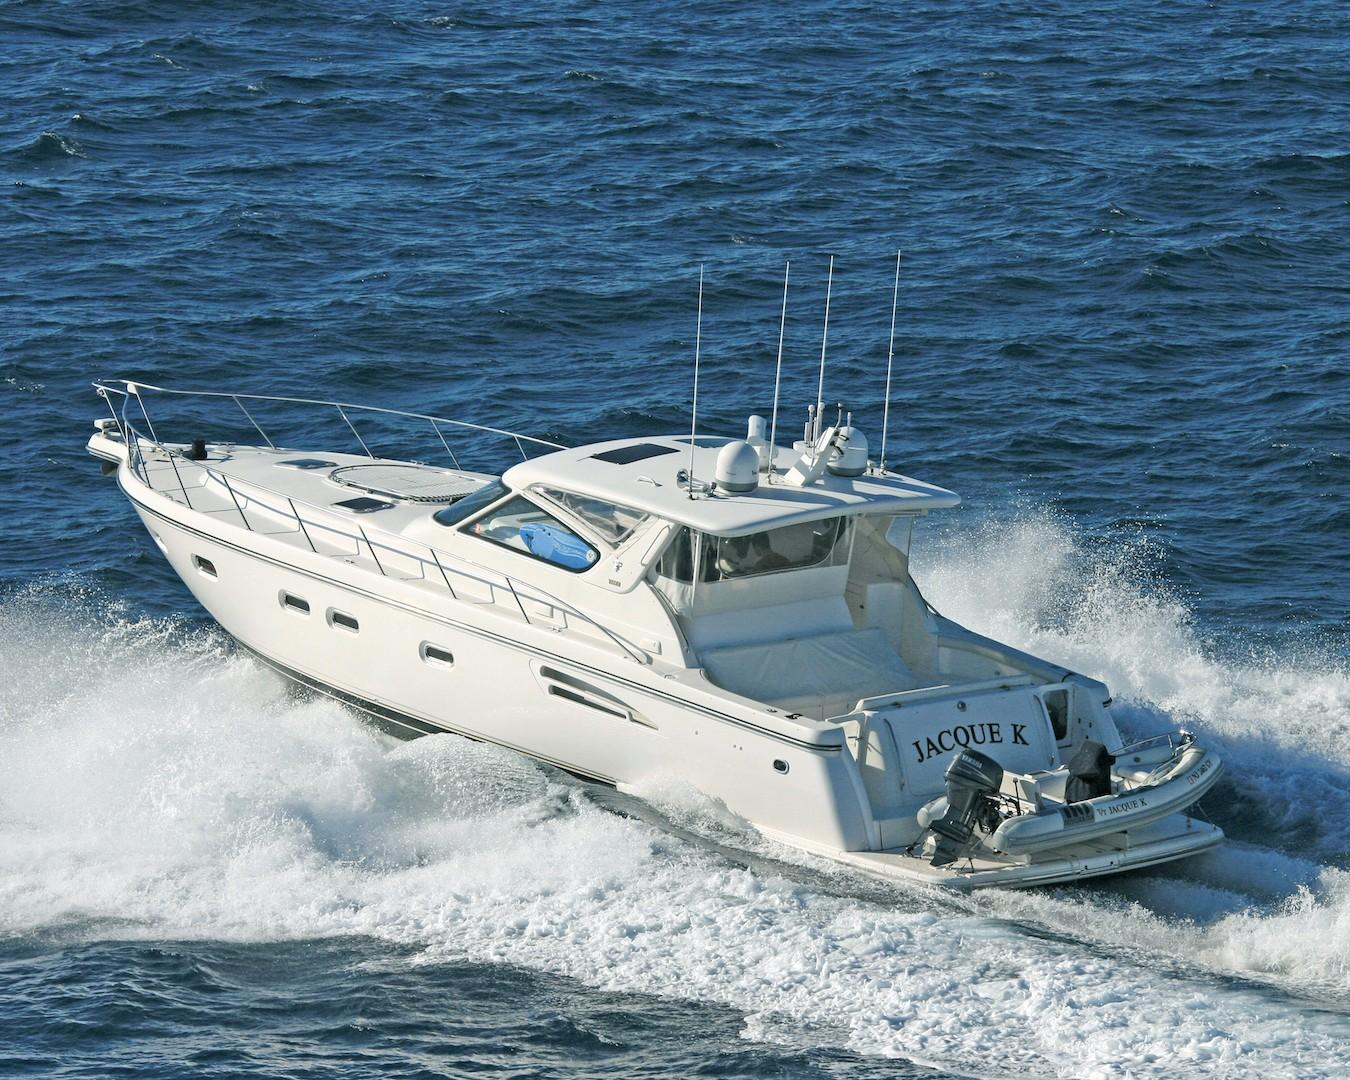 52 ft Tiara 5200 Express